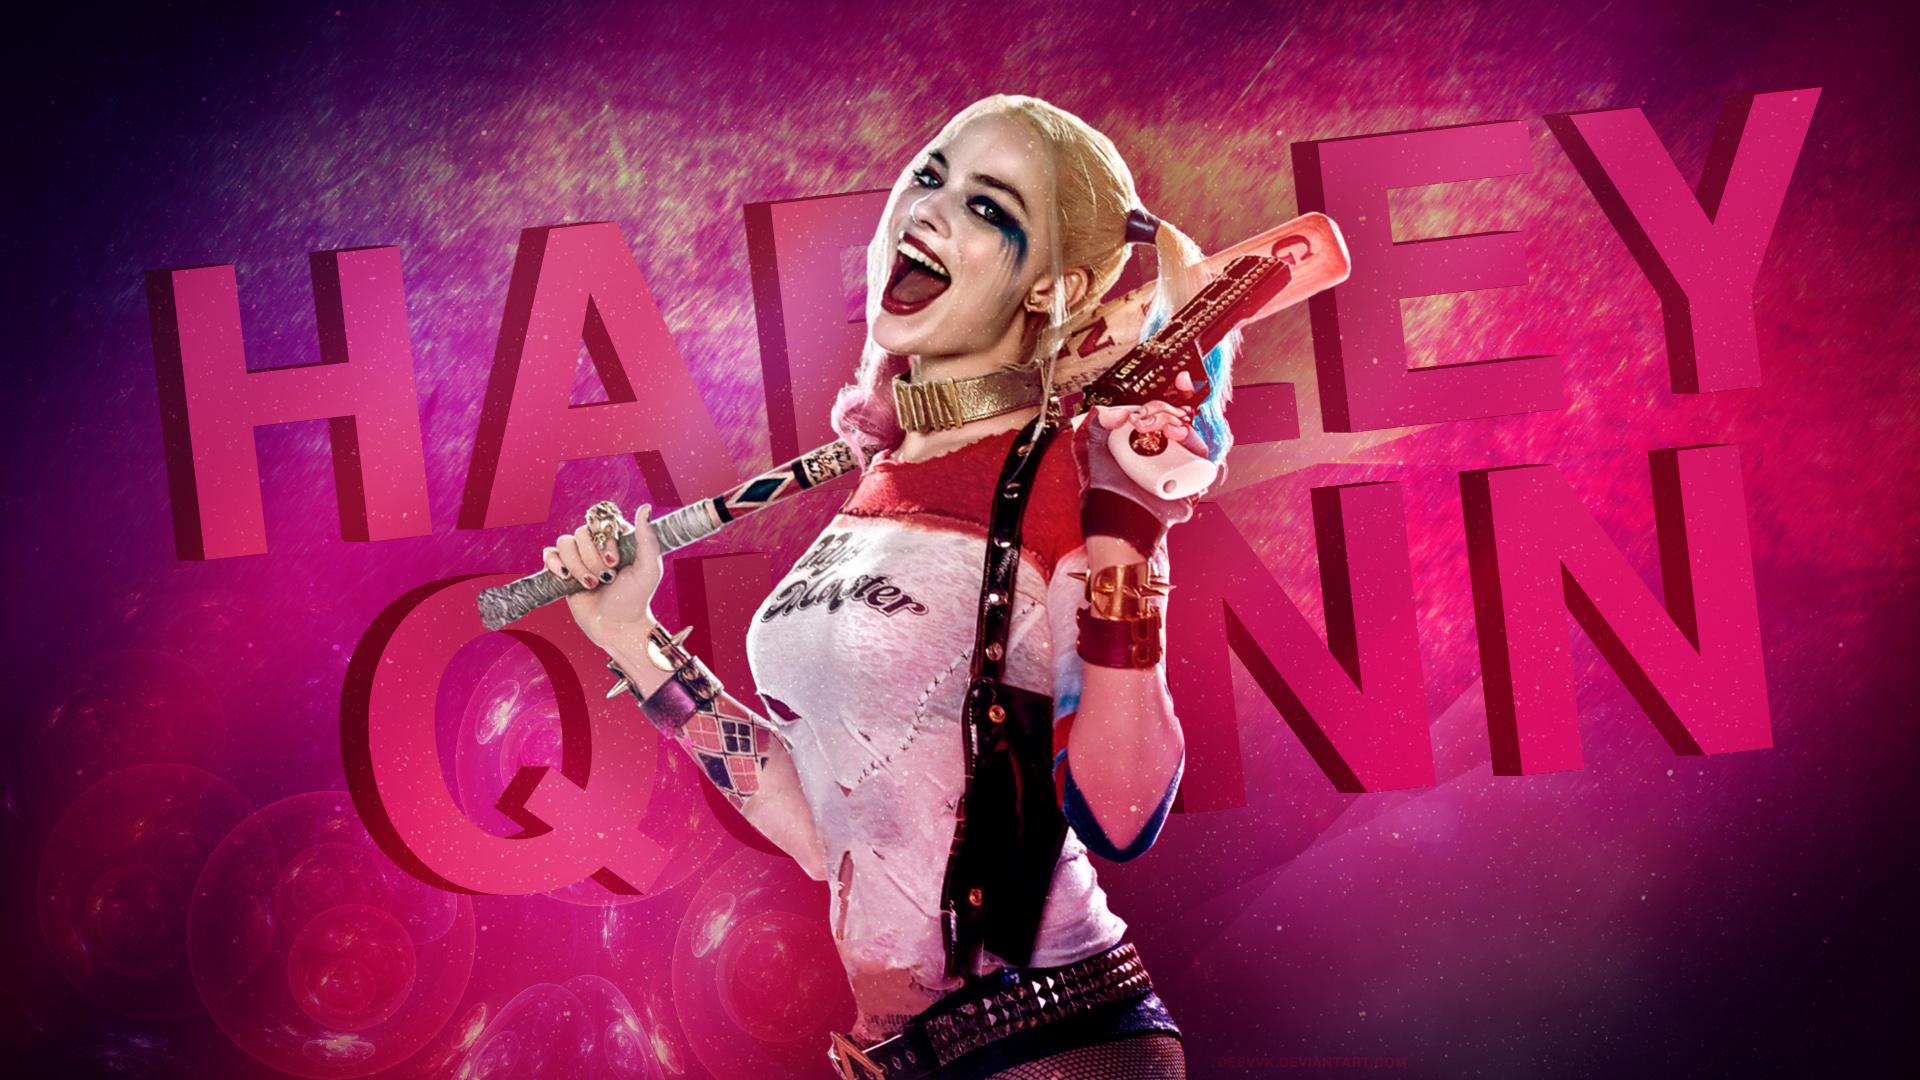 Harley Quinn Margot Robbie Hd Wallpaper By Deevvk On